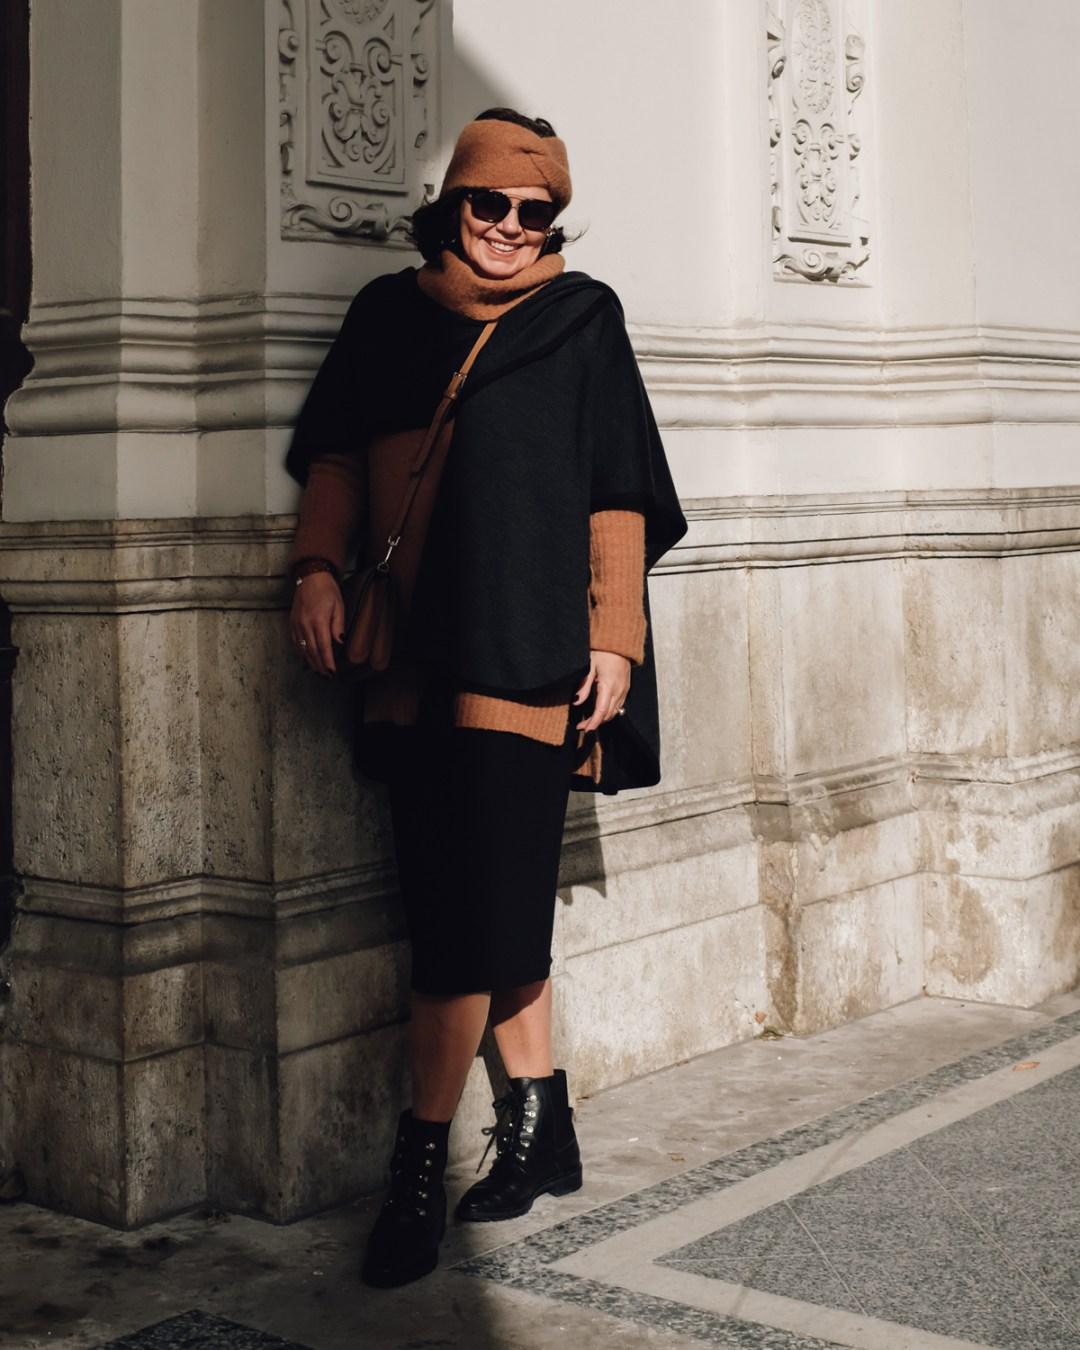 Inastil, Kobleder, Strickmode, Strickkollektion, Strick-Klassiker, Tradition, Innovation, Madeinaustria, Herbstmode, Ü50 Mode, Styleinspiration, Fashion, Modeberatung, Stilberatung-14